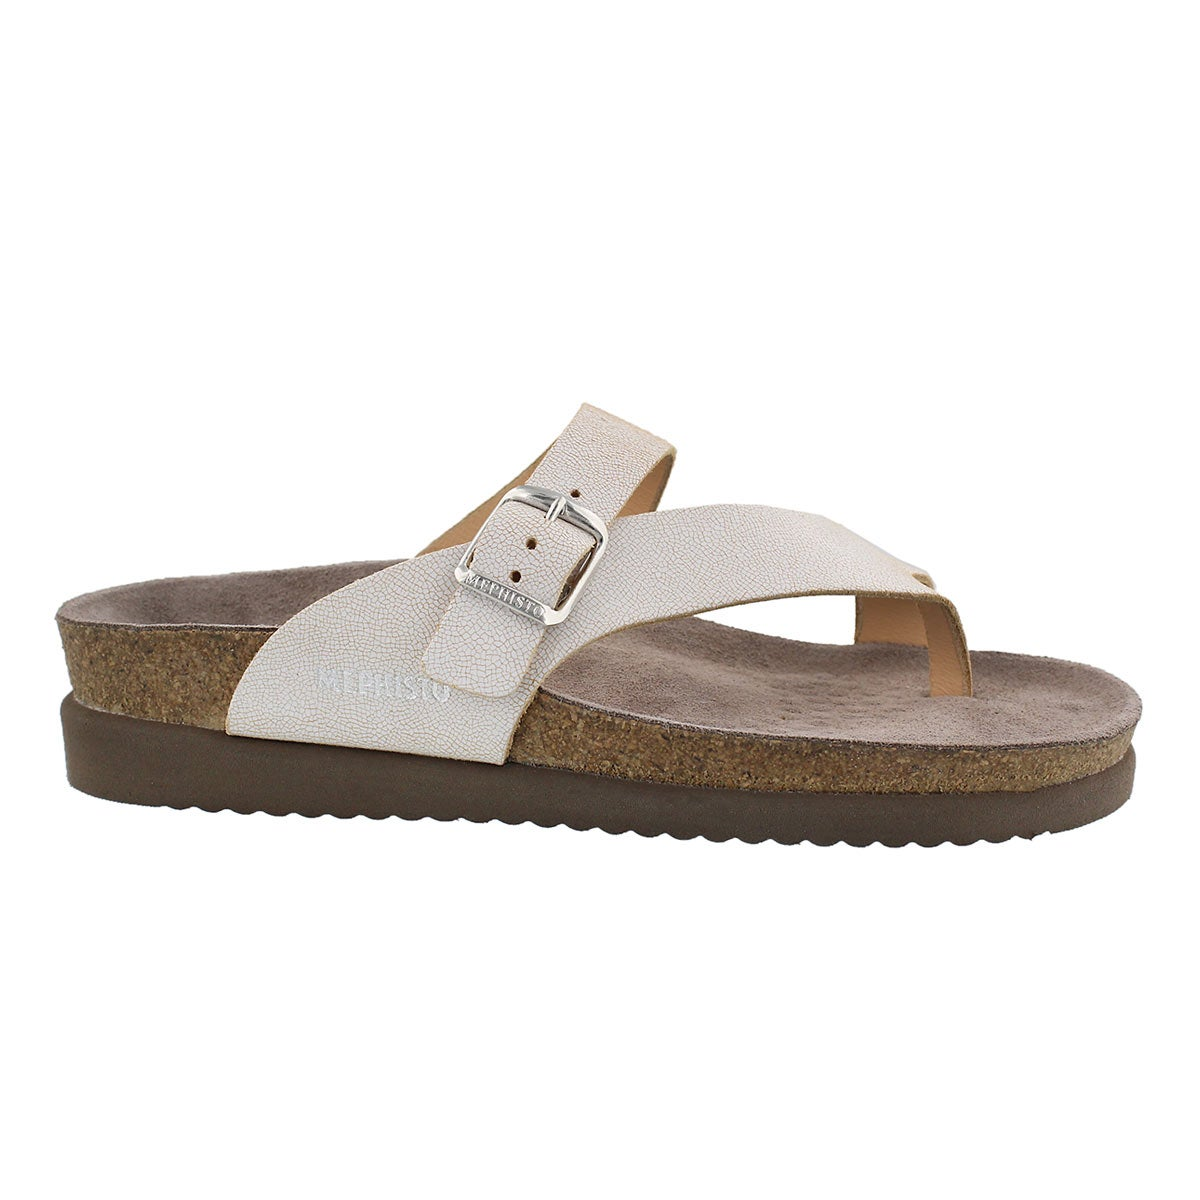 Lds Helen venise cork footbed thong